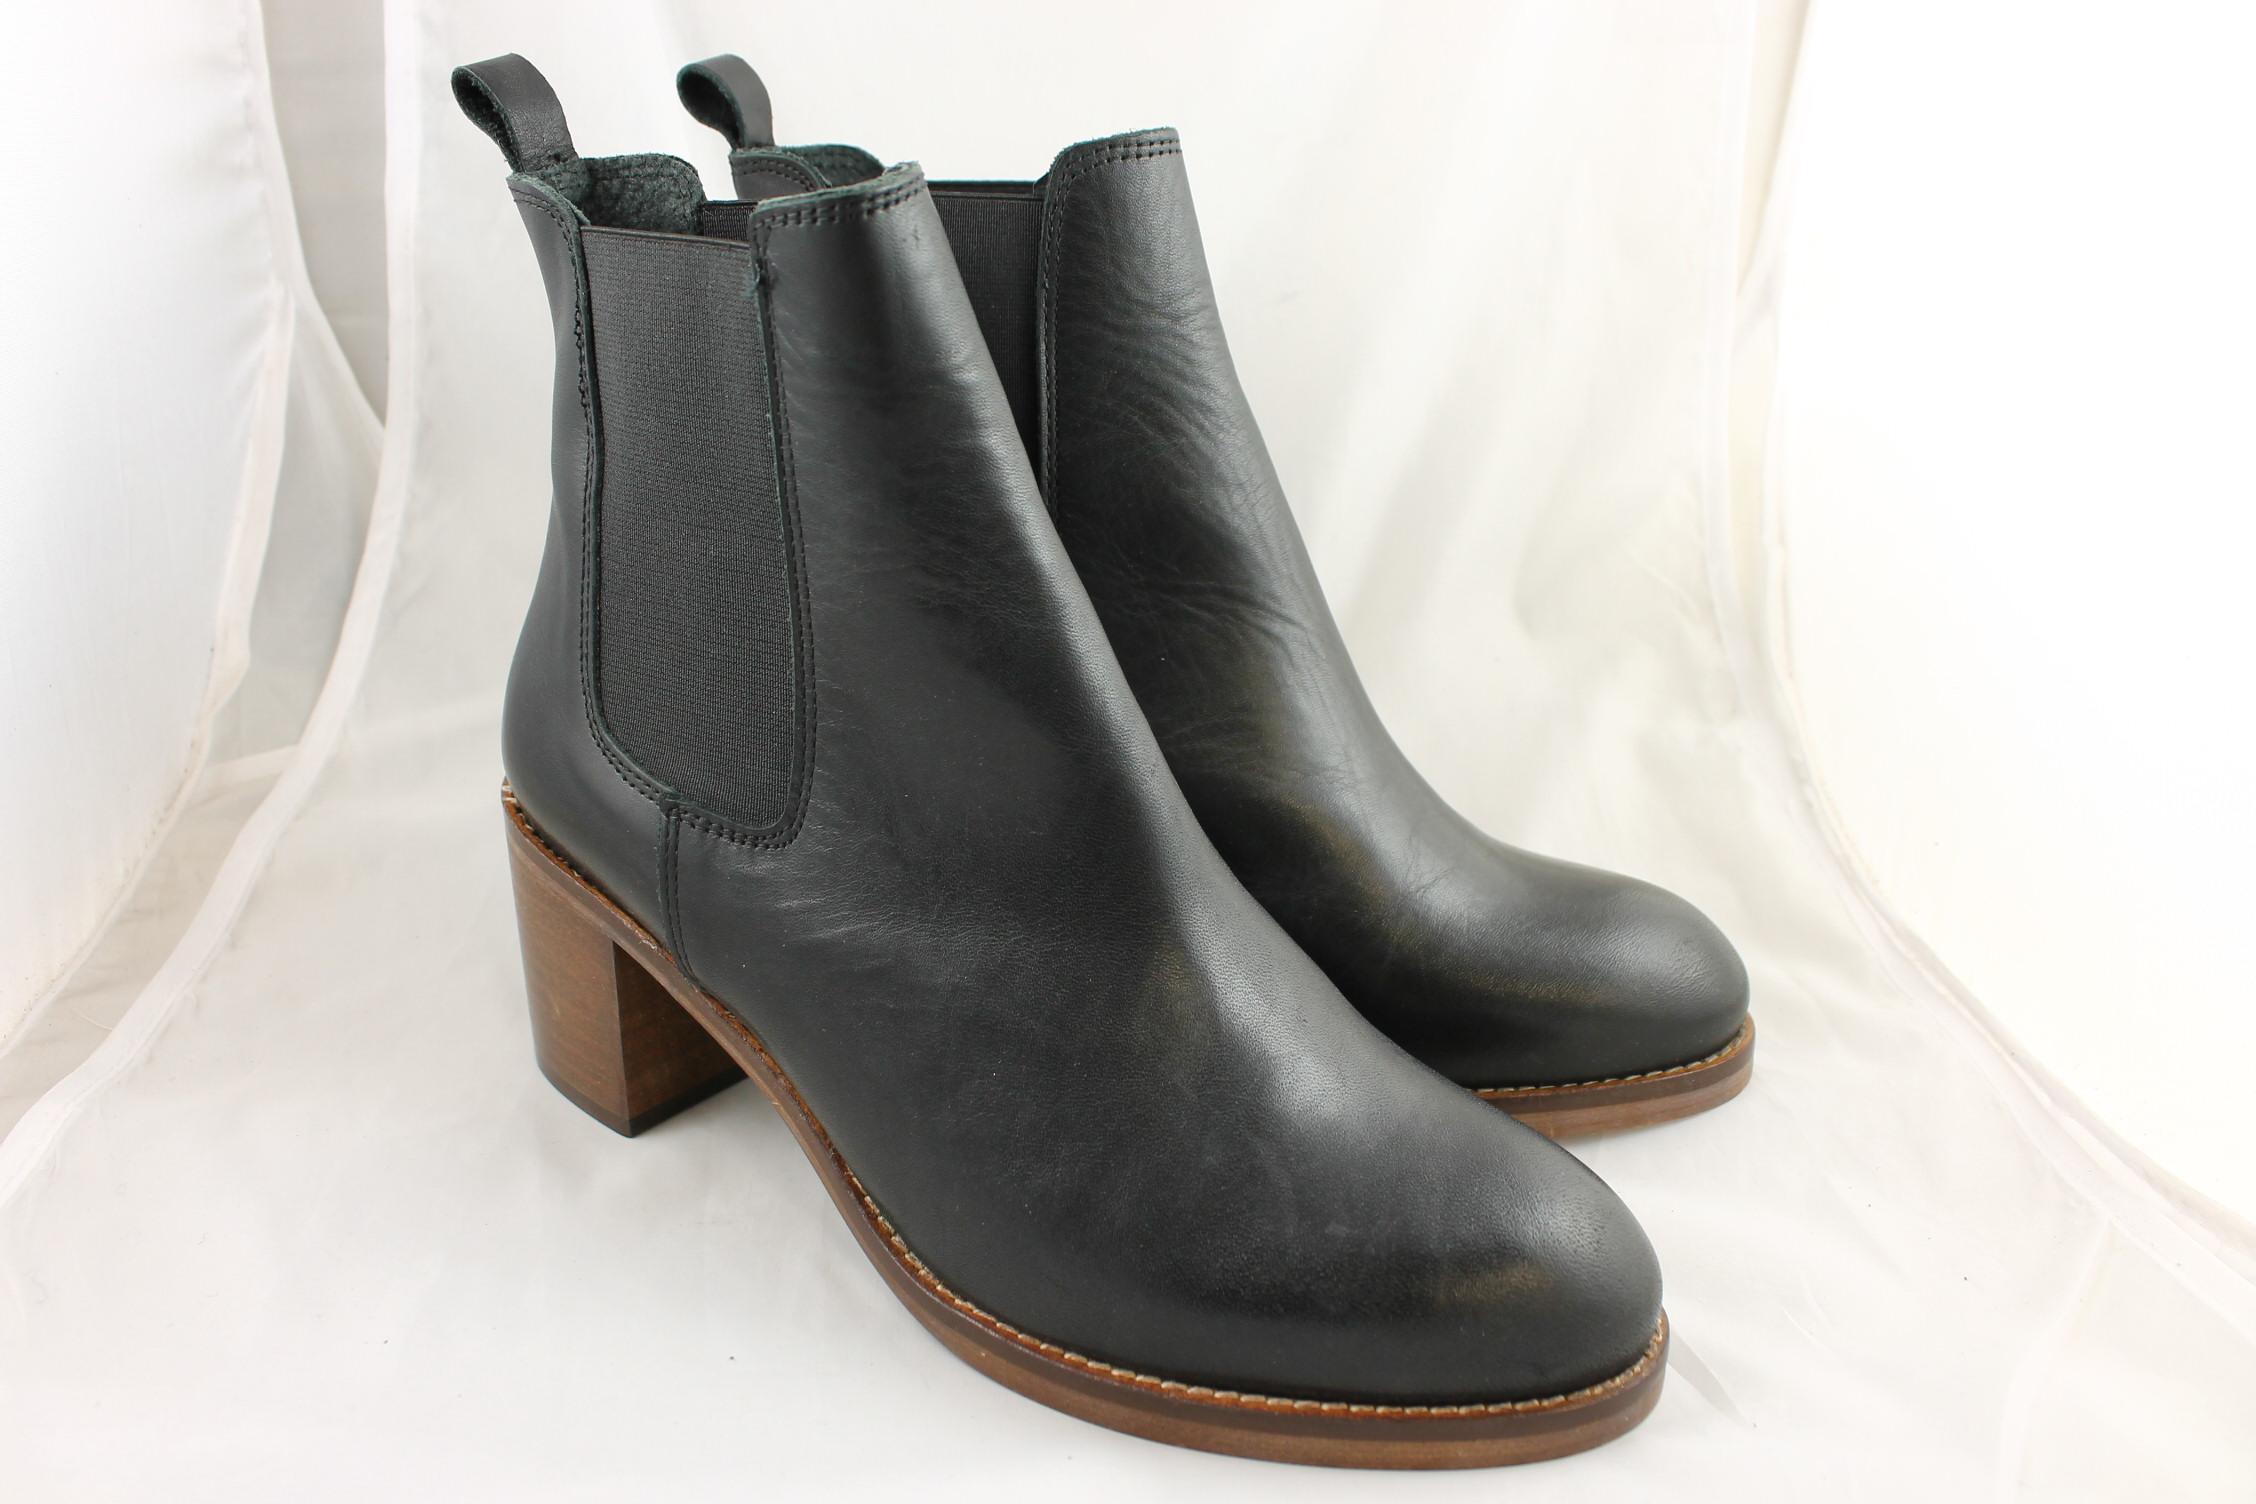 Womens-Office-Smart-Mid-Heel-Chelsea-Black-Leather-Boots-Ex-Display